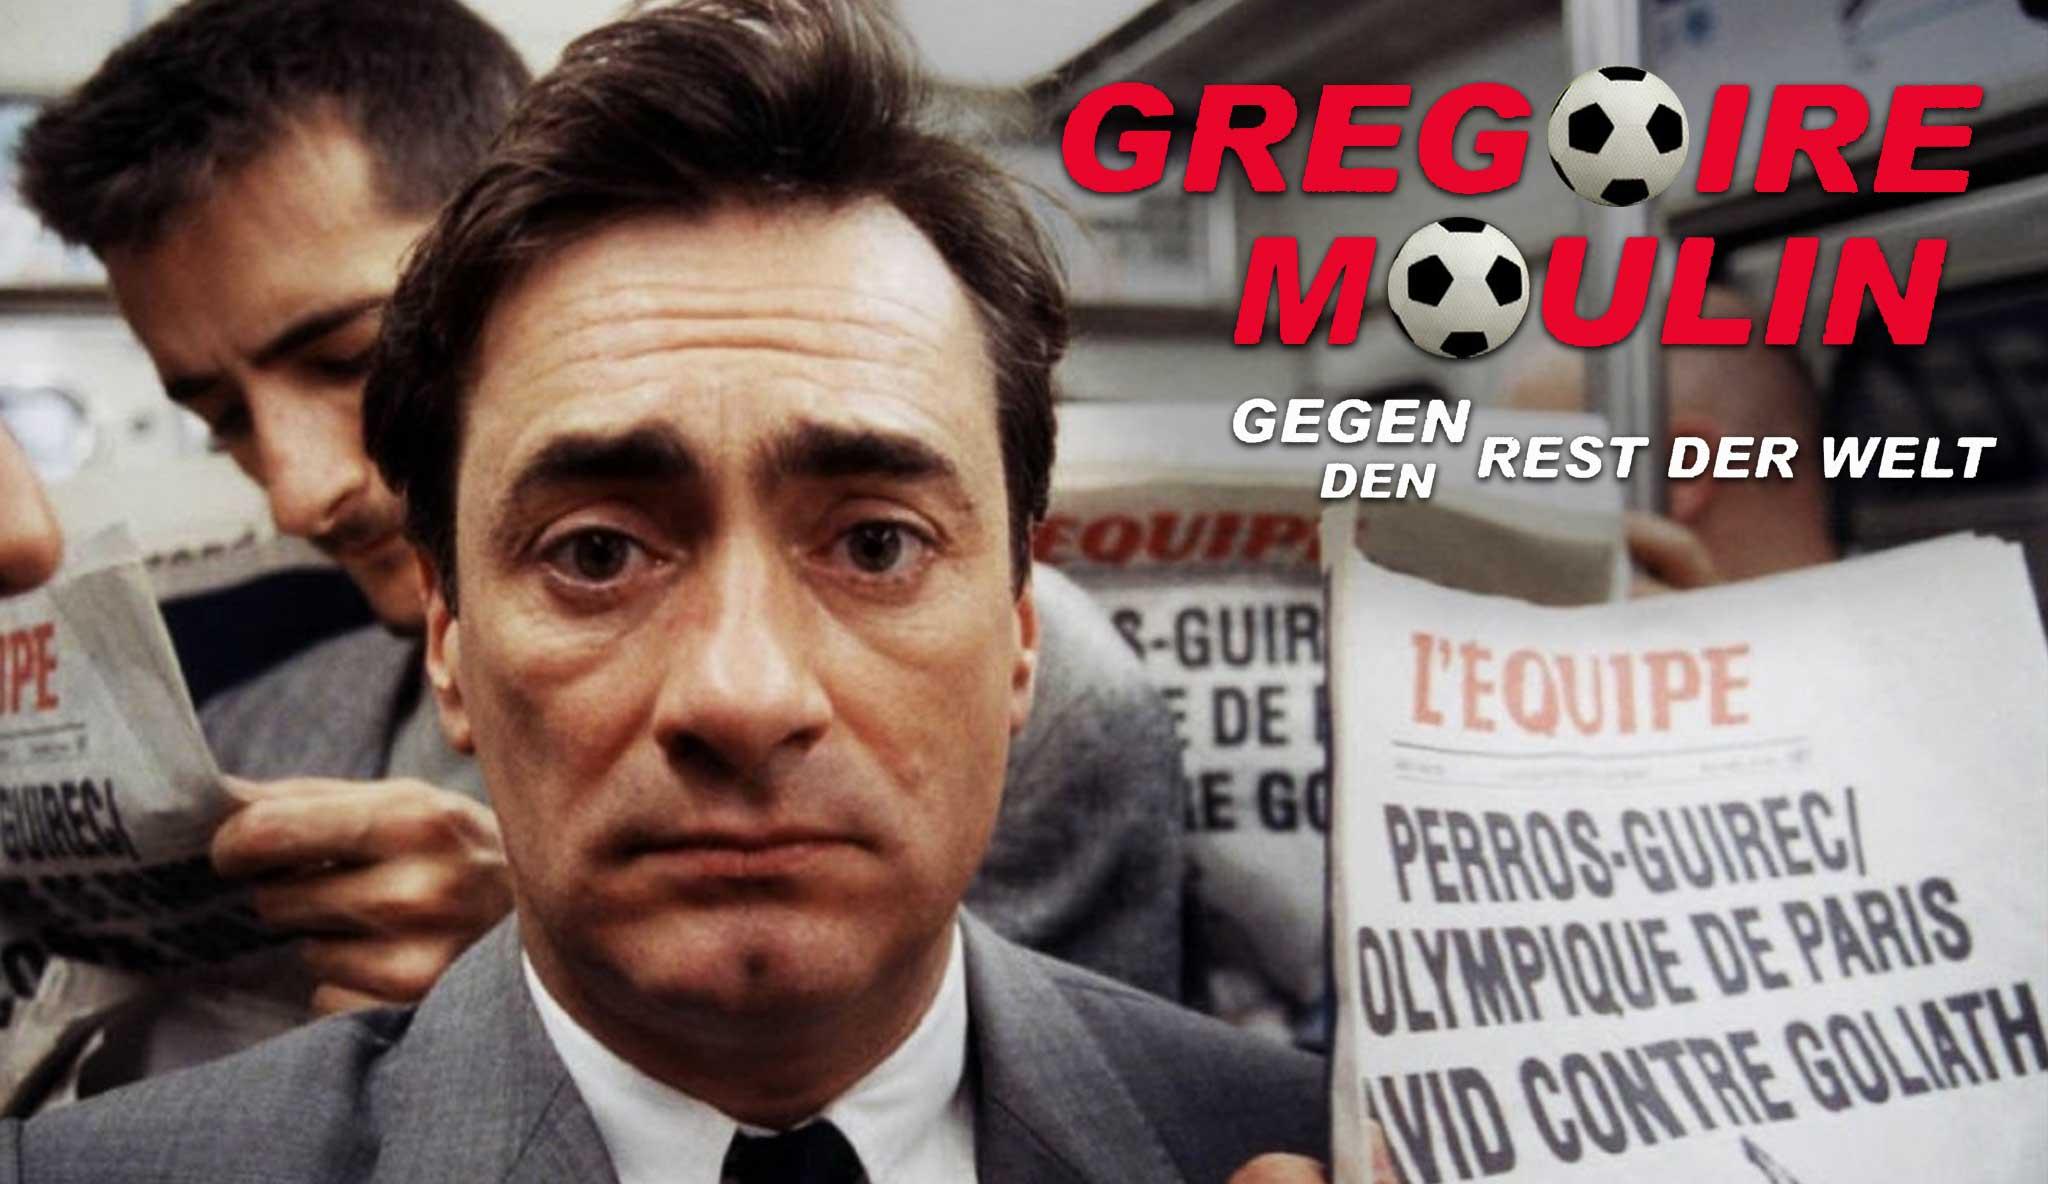 gregoire-moulin-gegen-den-rest-der-welt\header.jpg